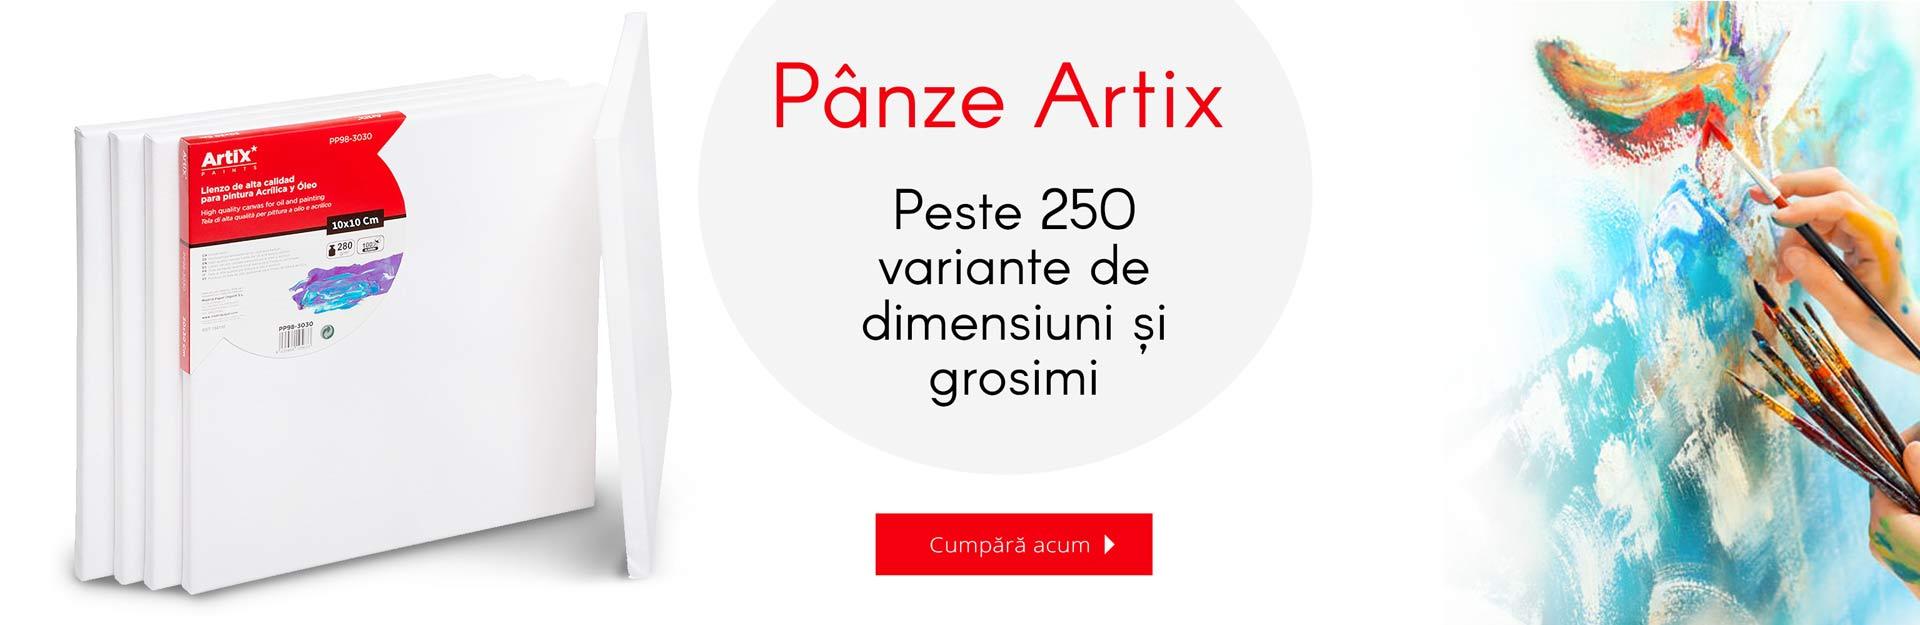 Panze - 250 modele